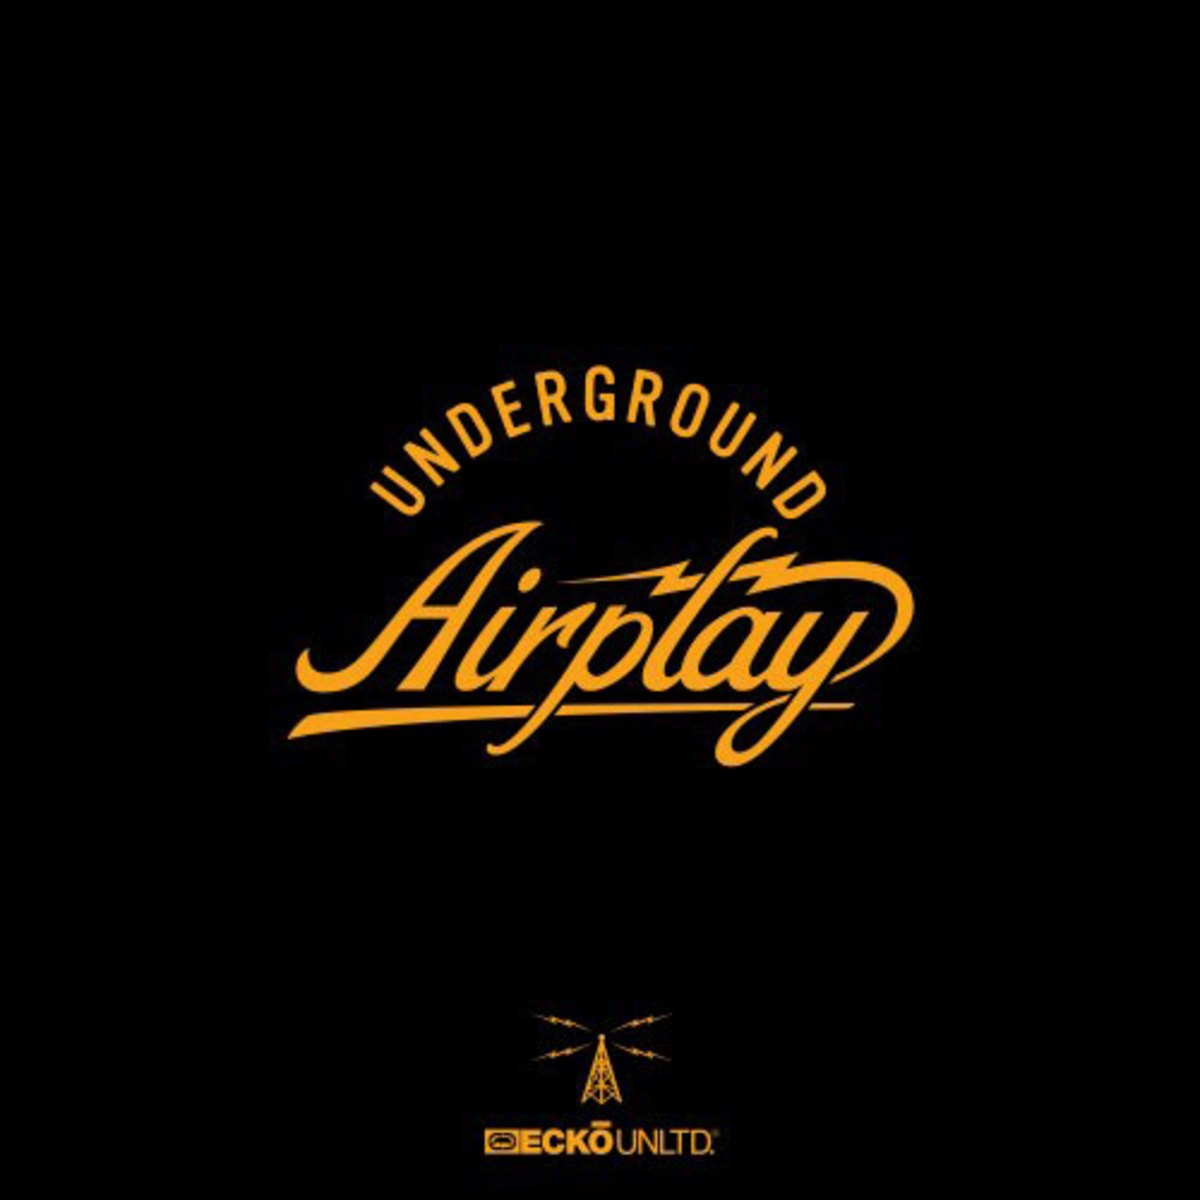 ecko-undergroundairplay.jpg